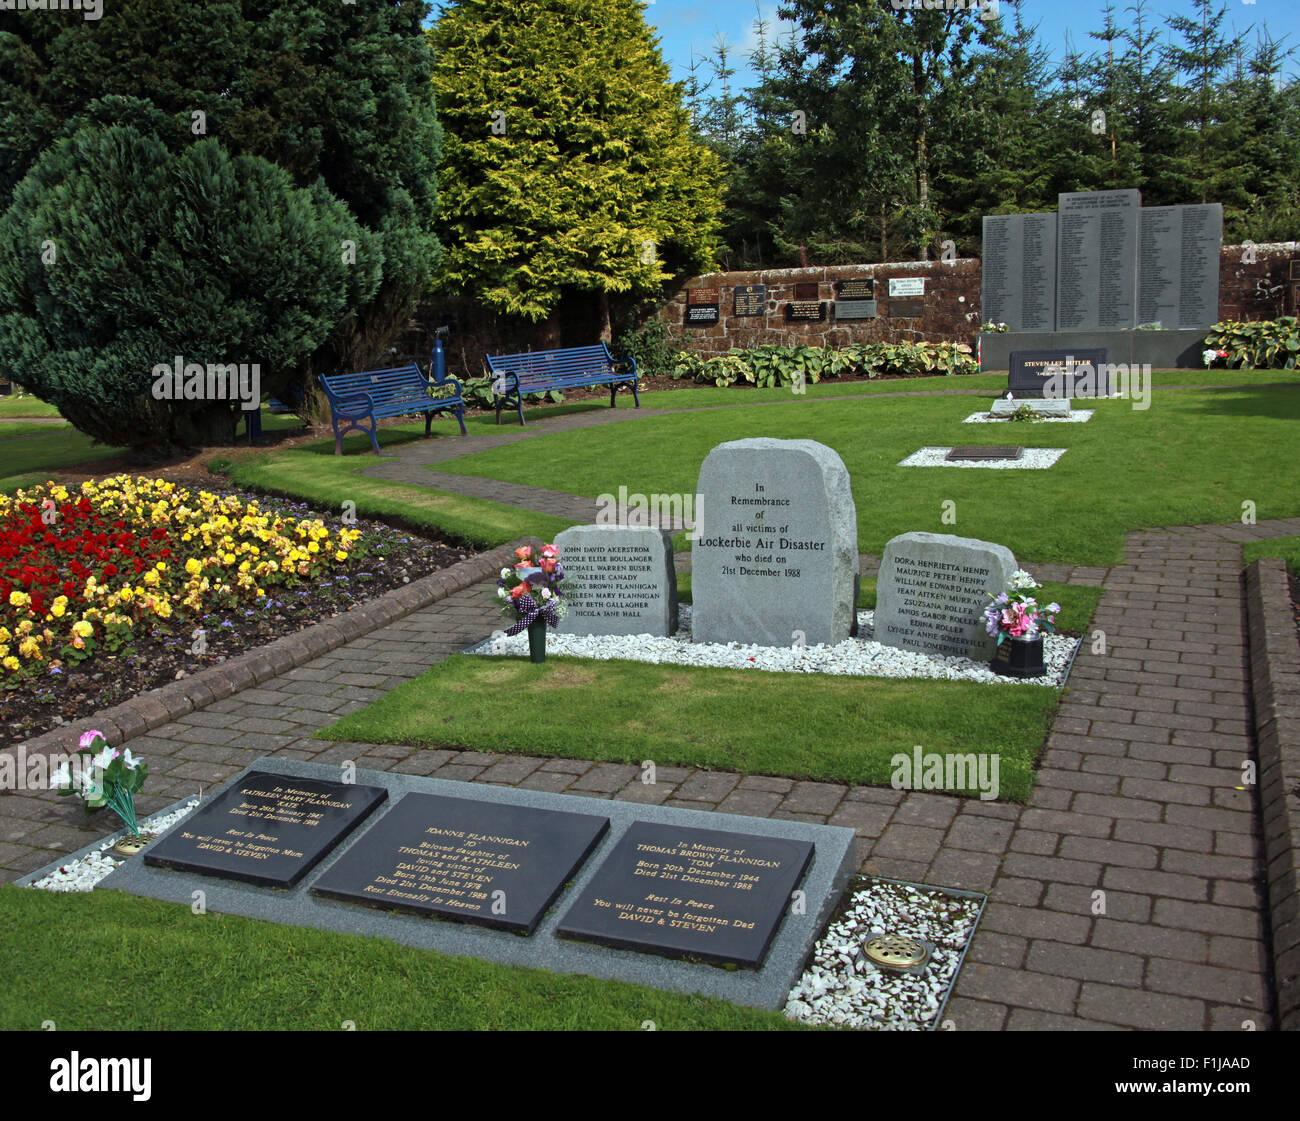 Lockerbie PanAm103 In Rememberance Memorial Garden, Scotland - Stock Image